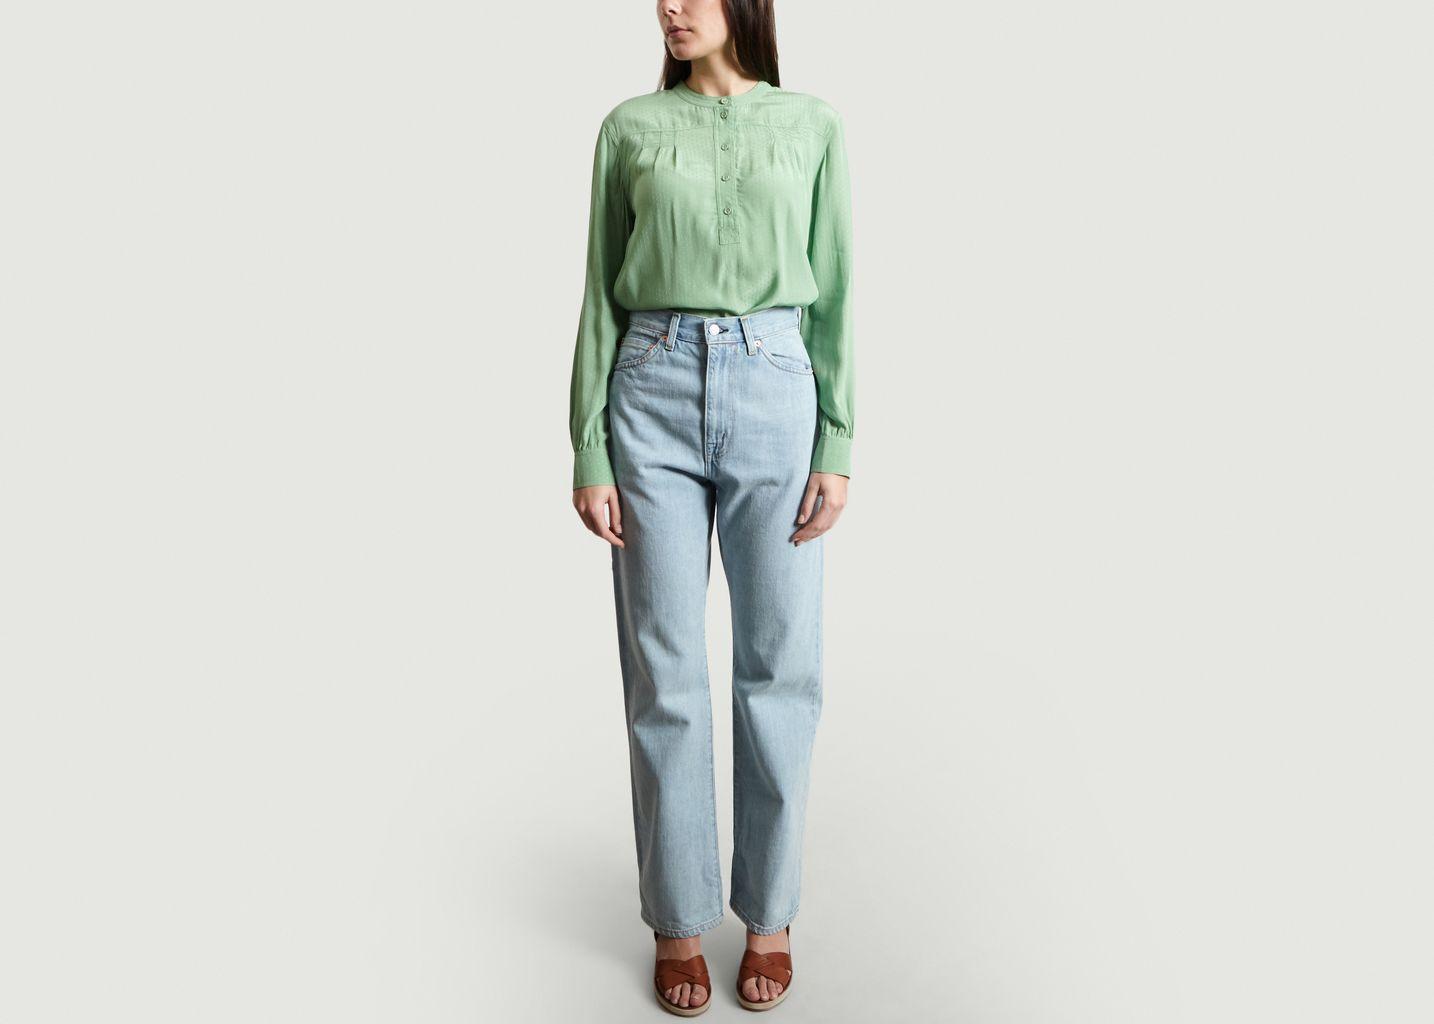 Jeans 1950's 701 Selvedge - Levi's Vintage Clothing